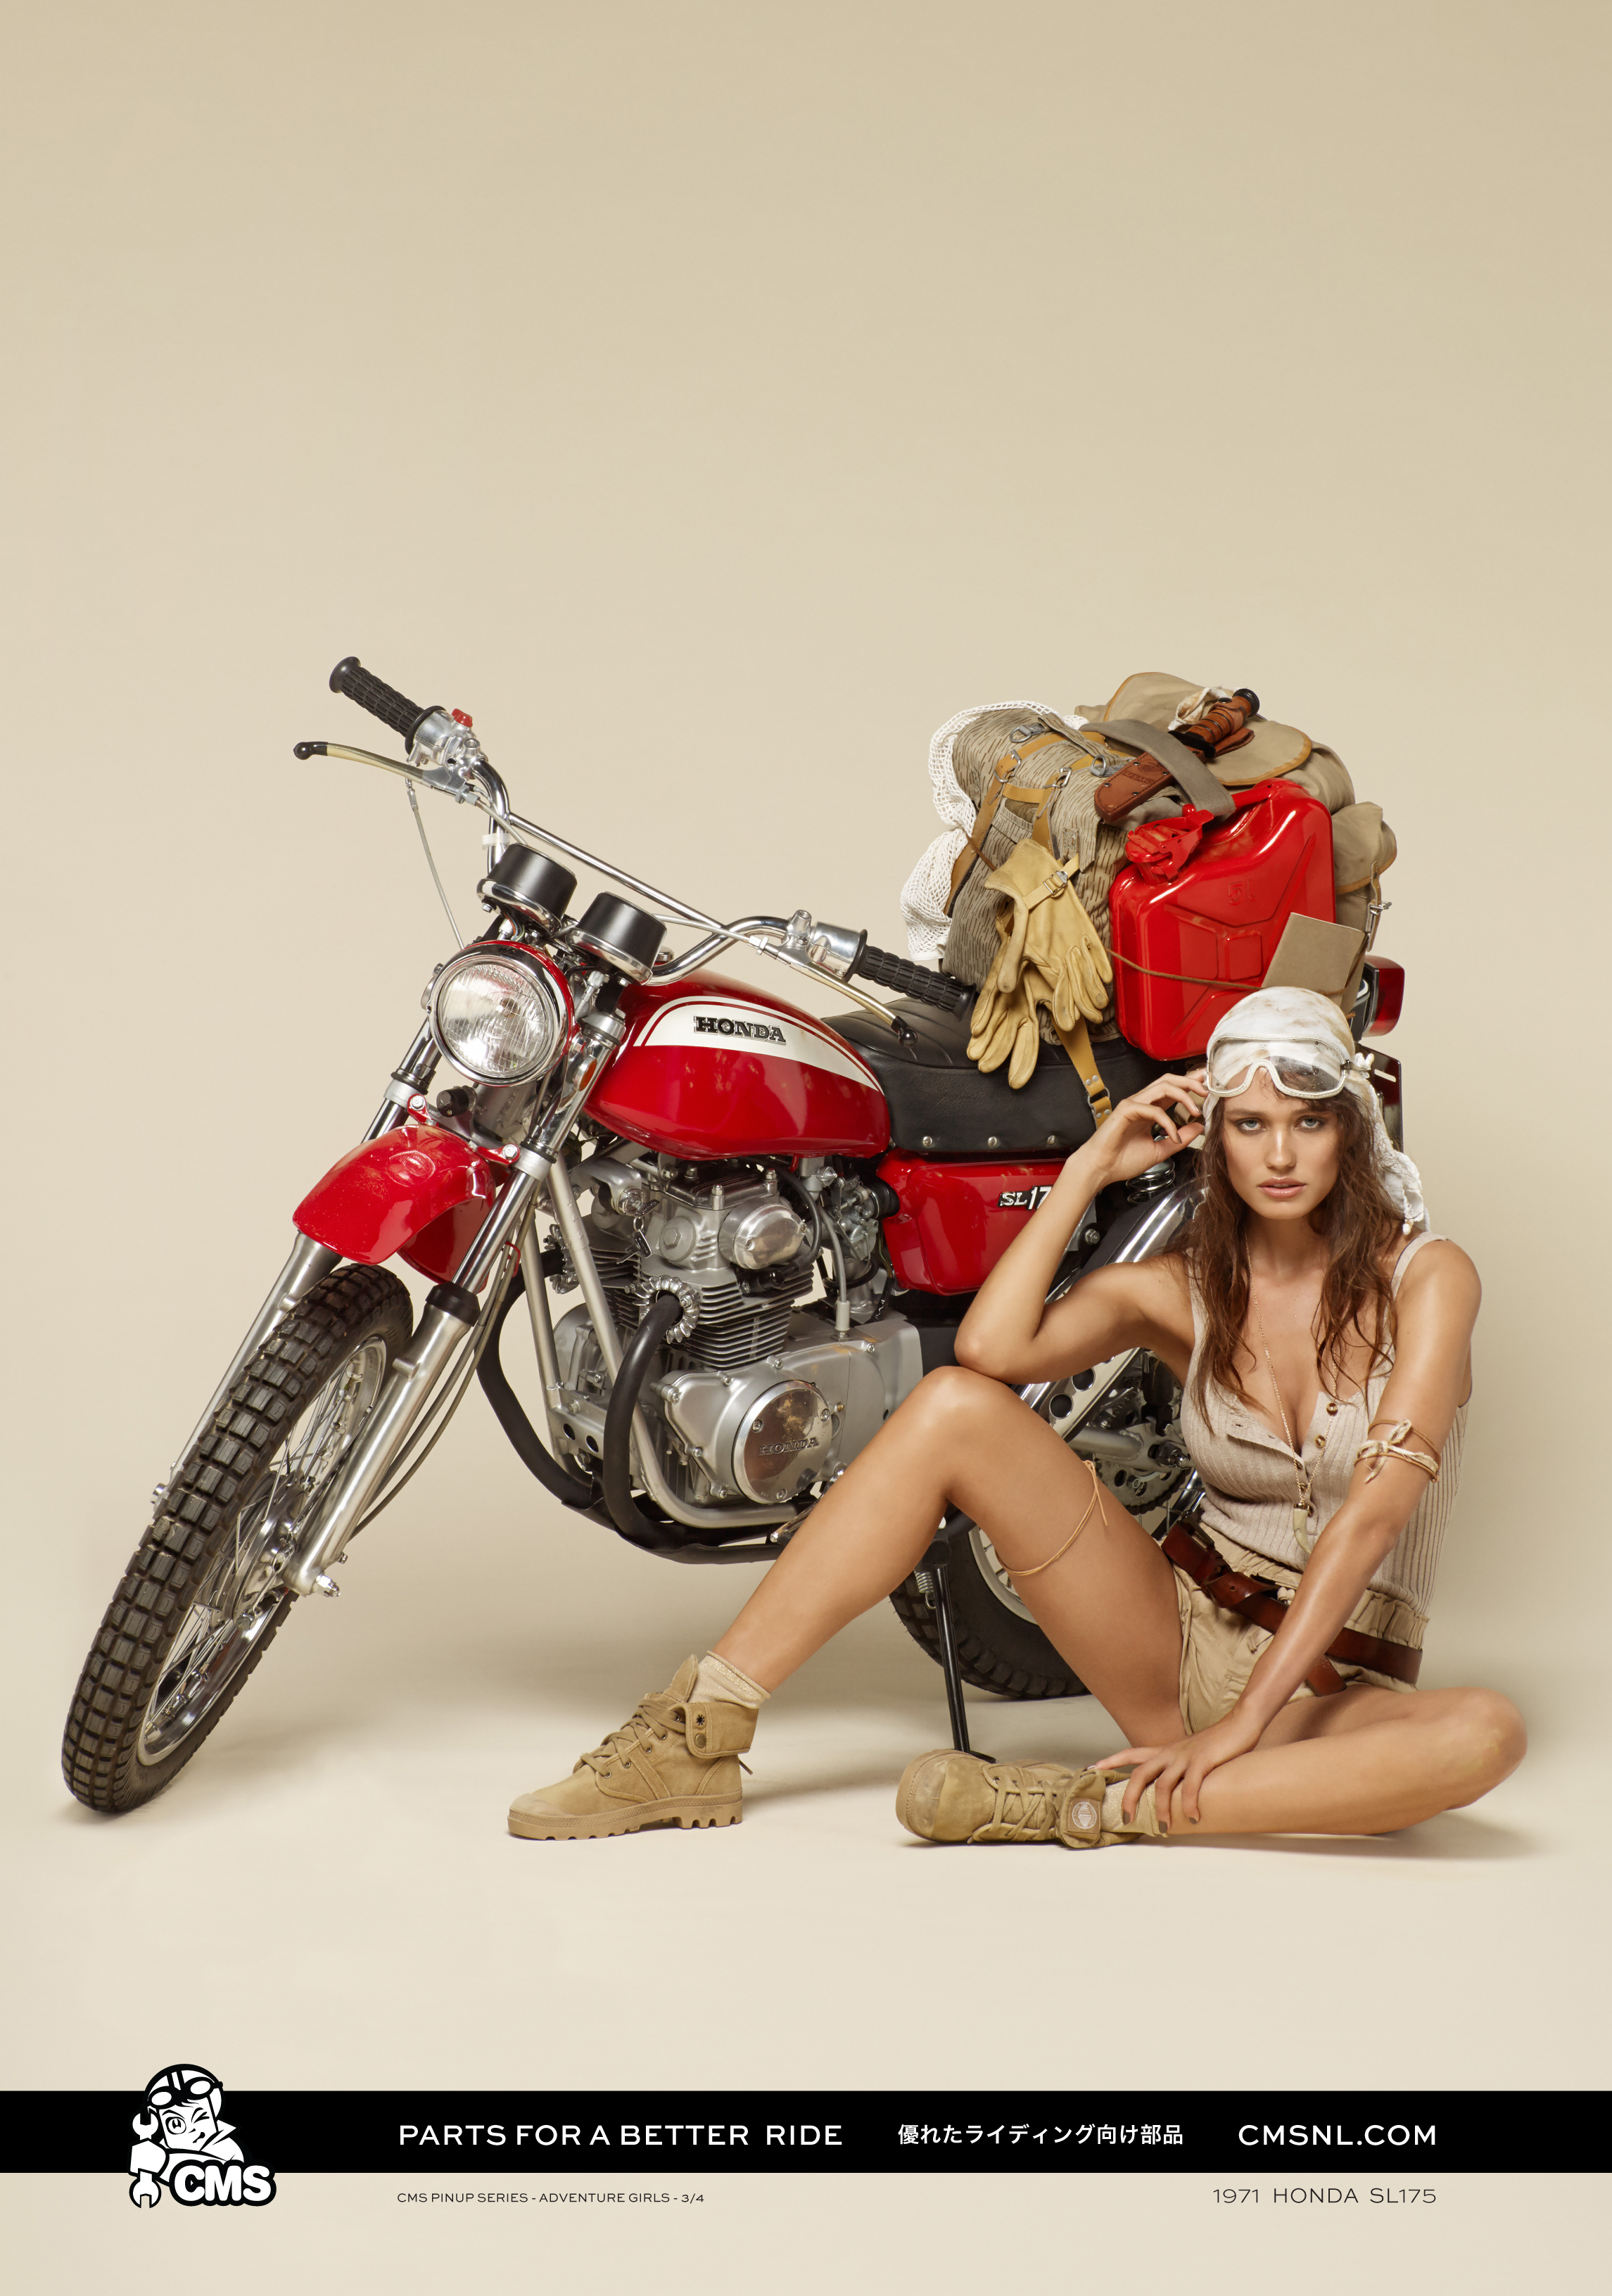 CMS-PosterA1-Adventure-Desert-HR